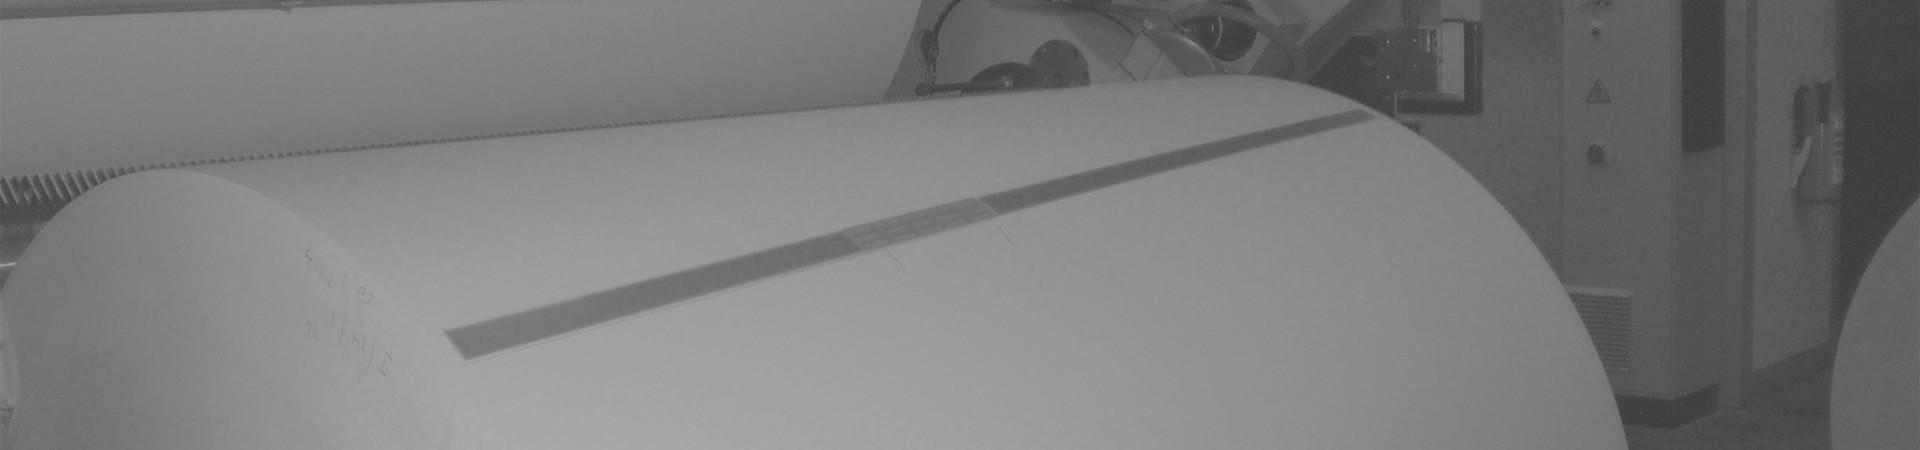 Industria del papel - Normecánica